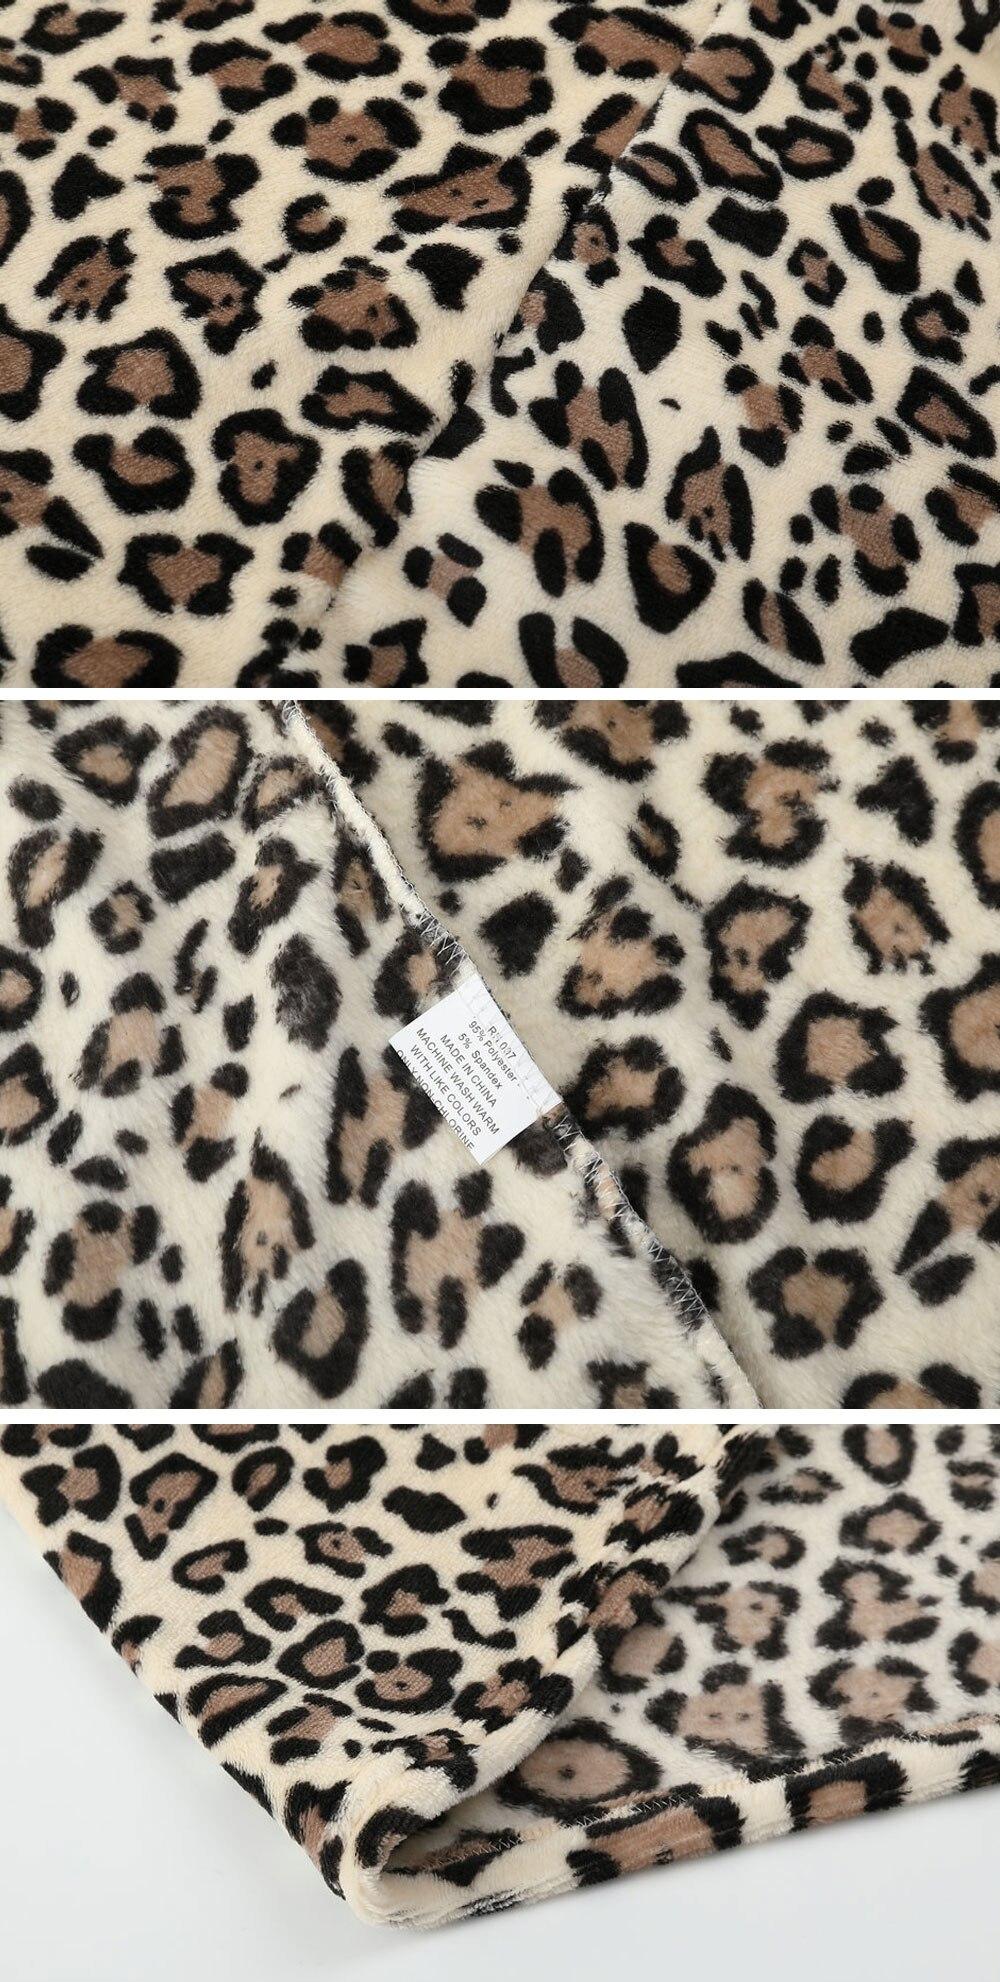 HTB1kN mXtjvK1RjSspiq6AEqXXaj Hirigin 2018 Newest Hot Womens Winter Leopard Fluffy Fleece Jacket Coat Cardigans Hooded Jumper Tops Clubwear